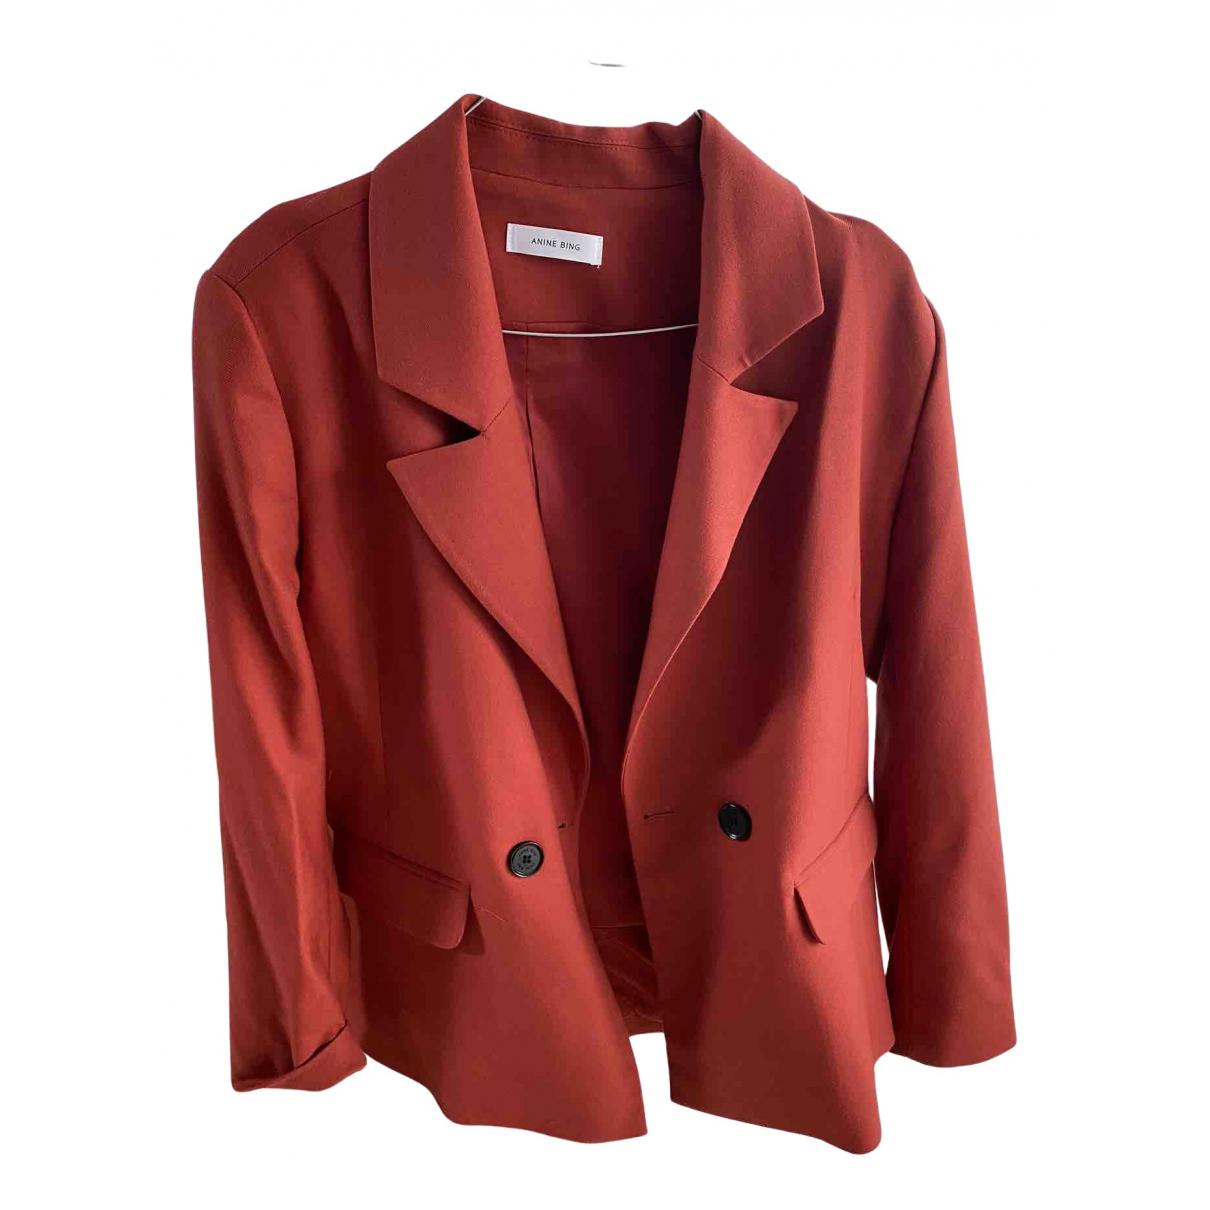 Anine Bing Spring Summer 2020 Jacke in  Rot Polyester